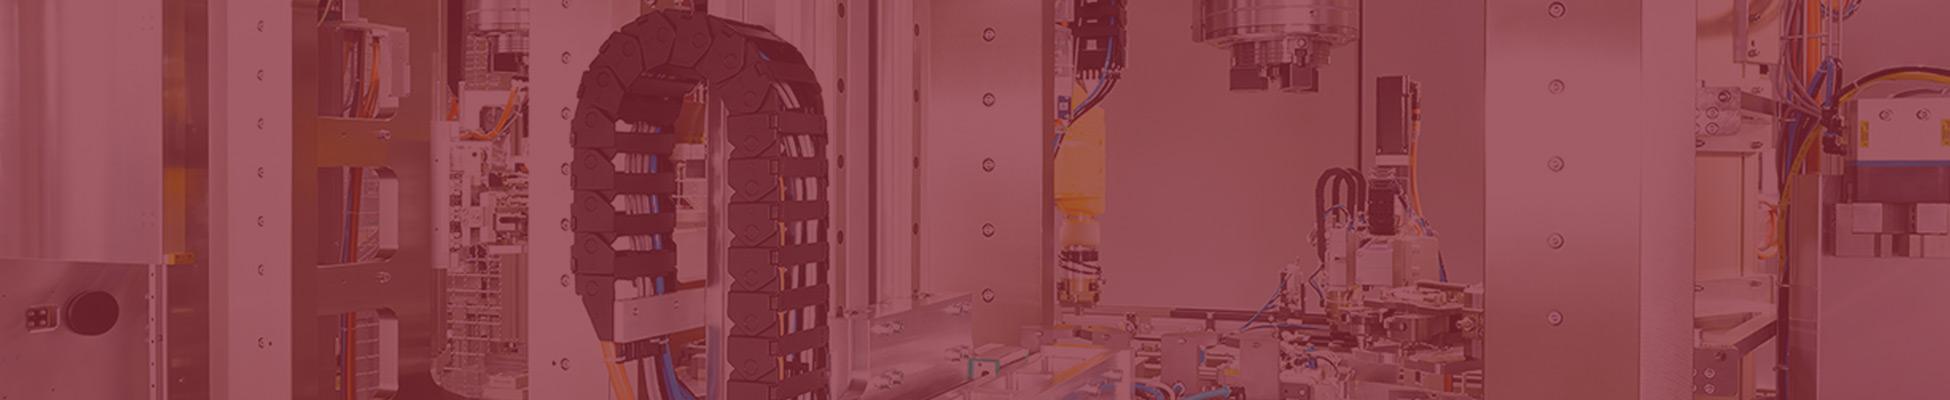 Slider Sondermaschinenbau